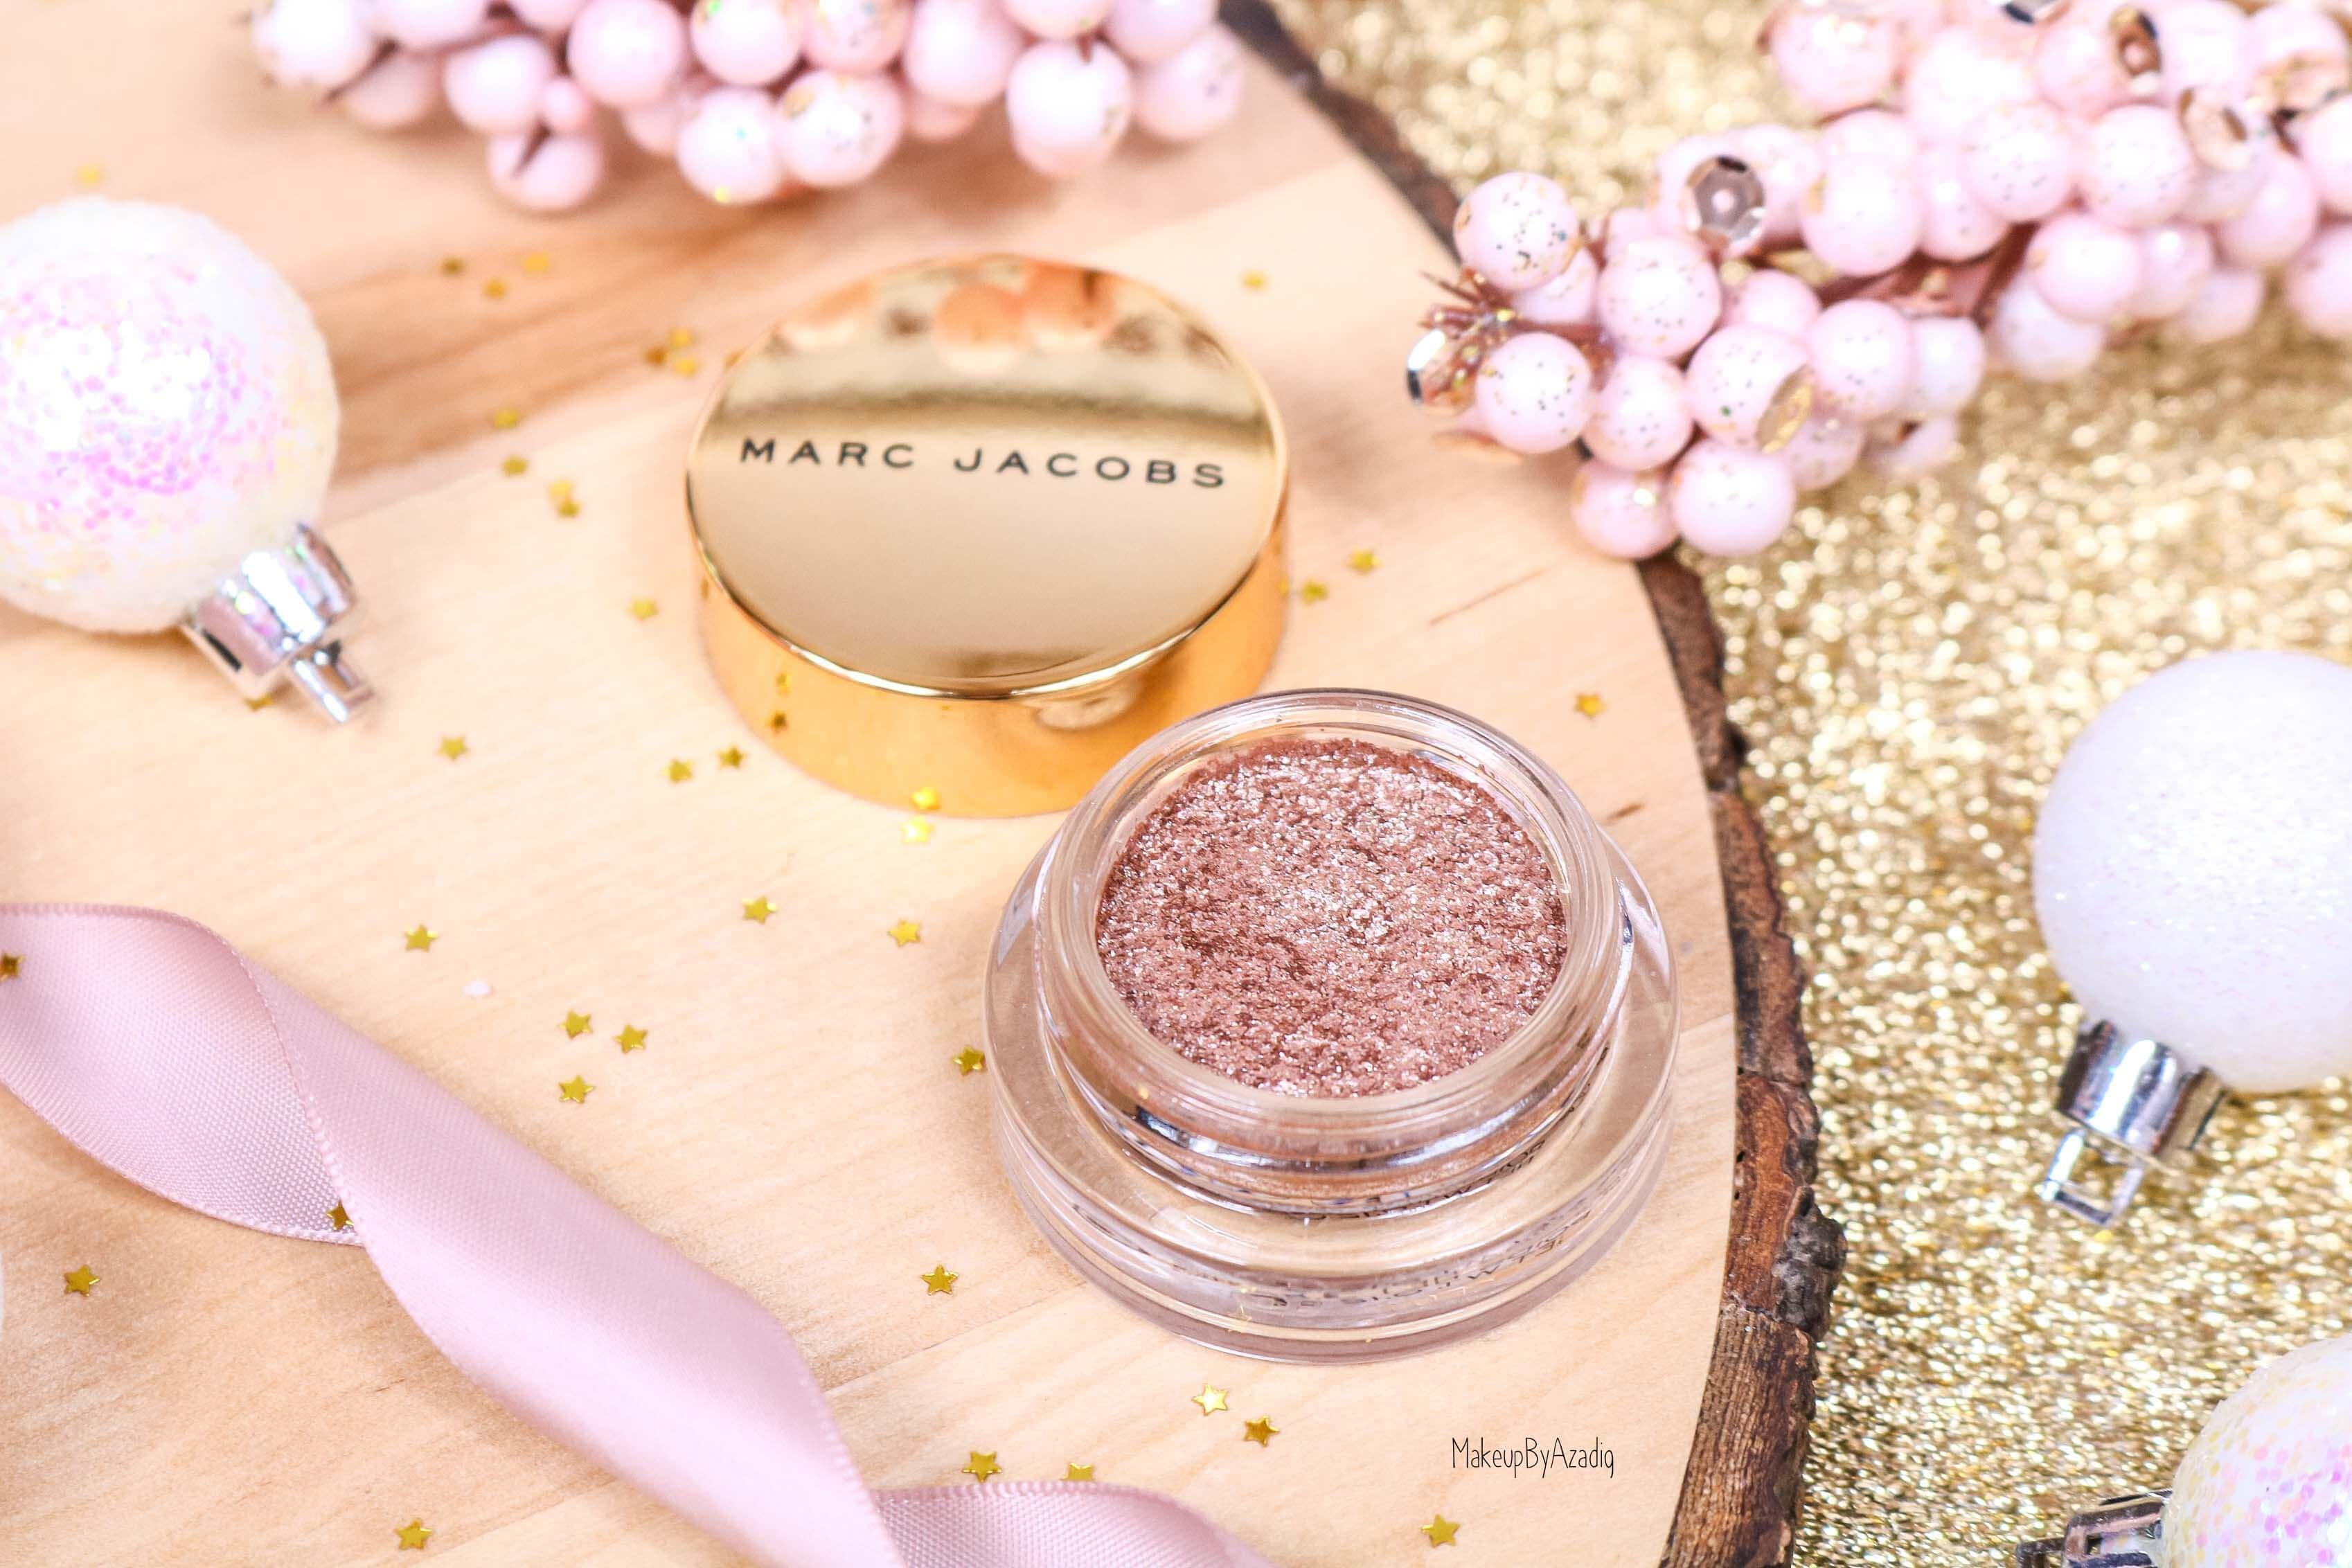 revue-fard-paupieres-paillete-marc-jacobs-beauty-gleam-girl-makeupbyazadig-avis-prix-swatch-lumineux